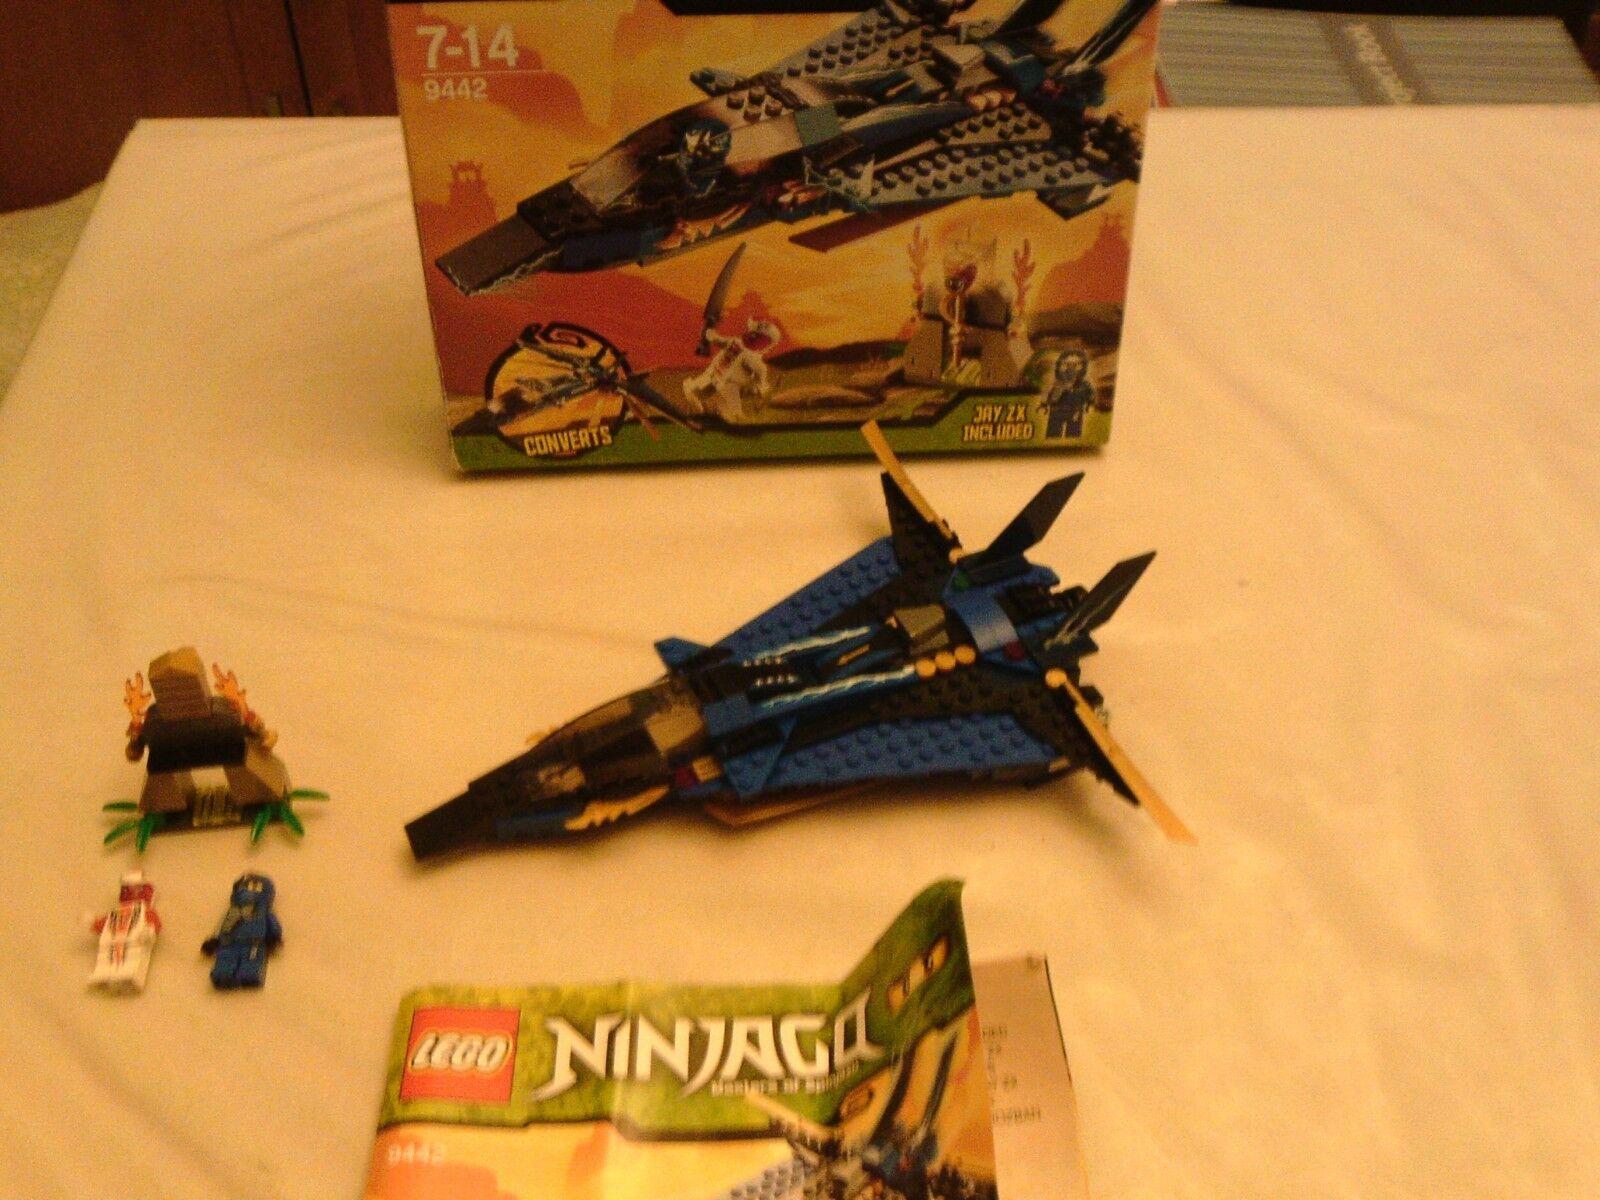 Lego Ninjago 9442 - Jay's Storm Fighter - 100% Complete, Box, Instructions